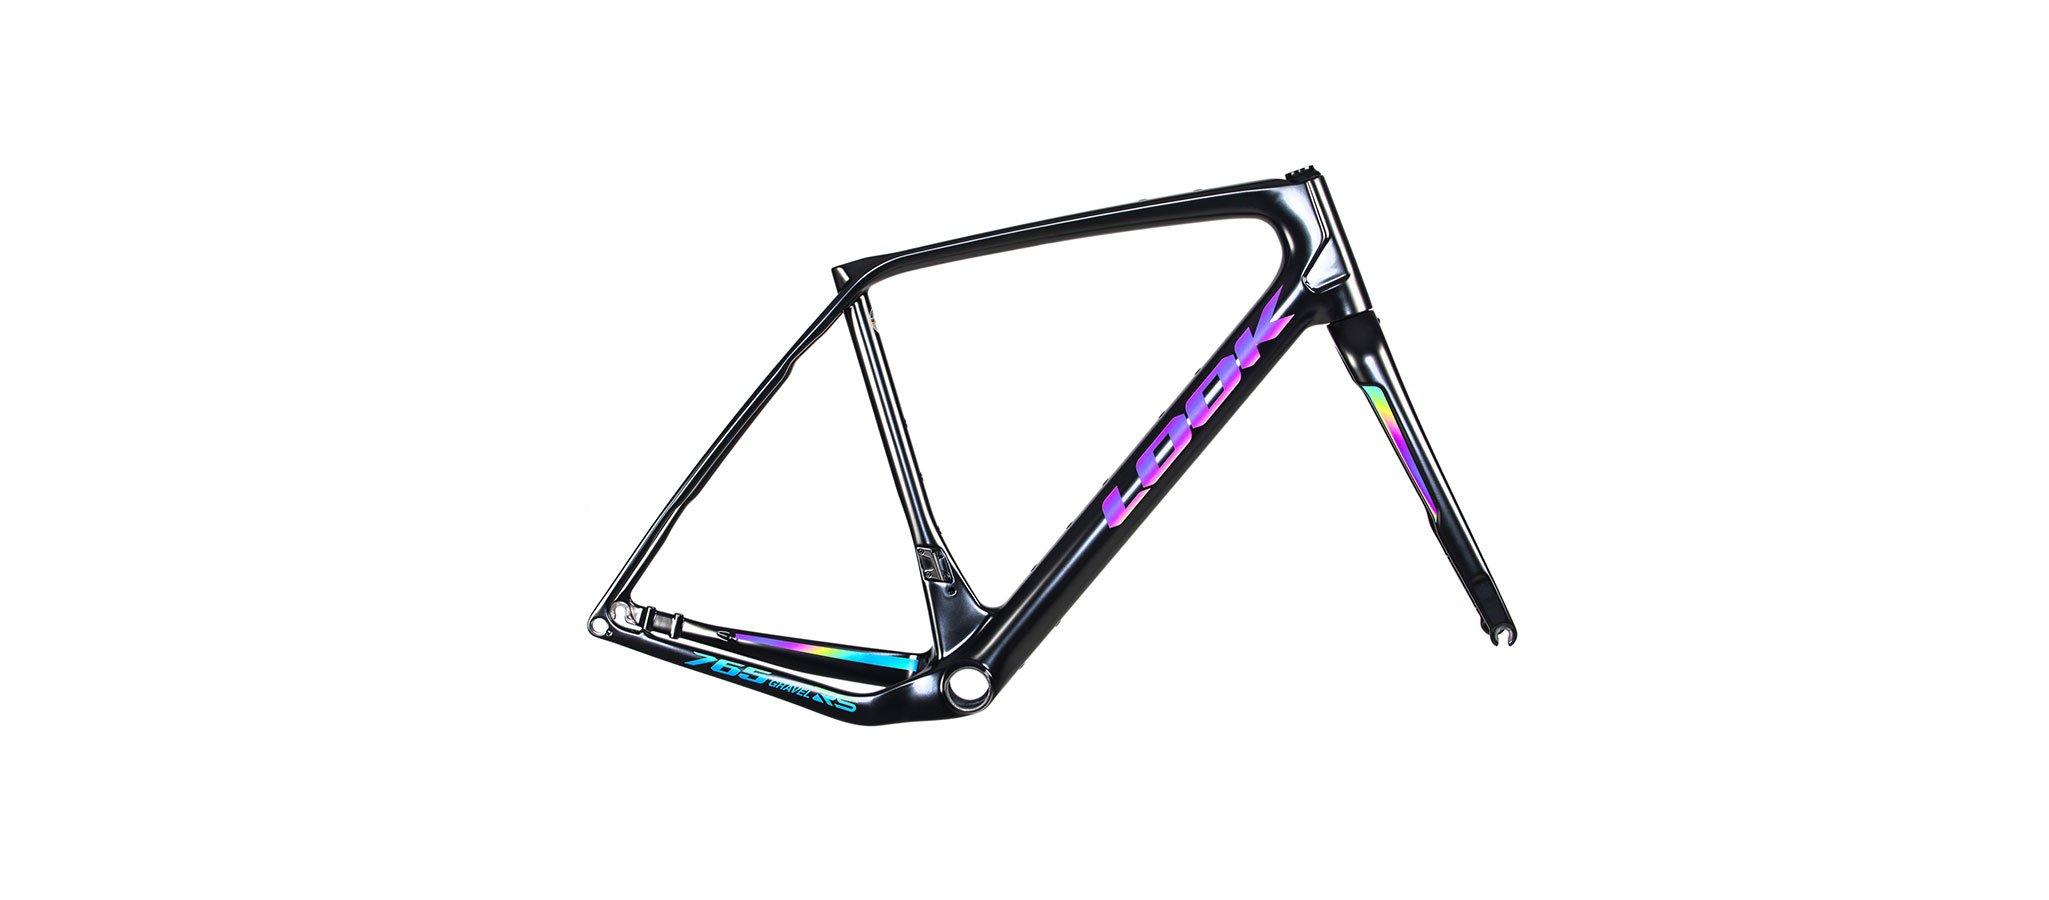 765-gravel-rs-chromatic-petrol-color